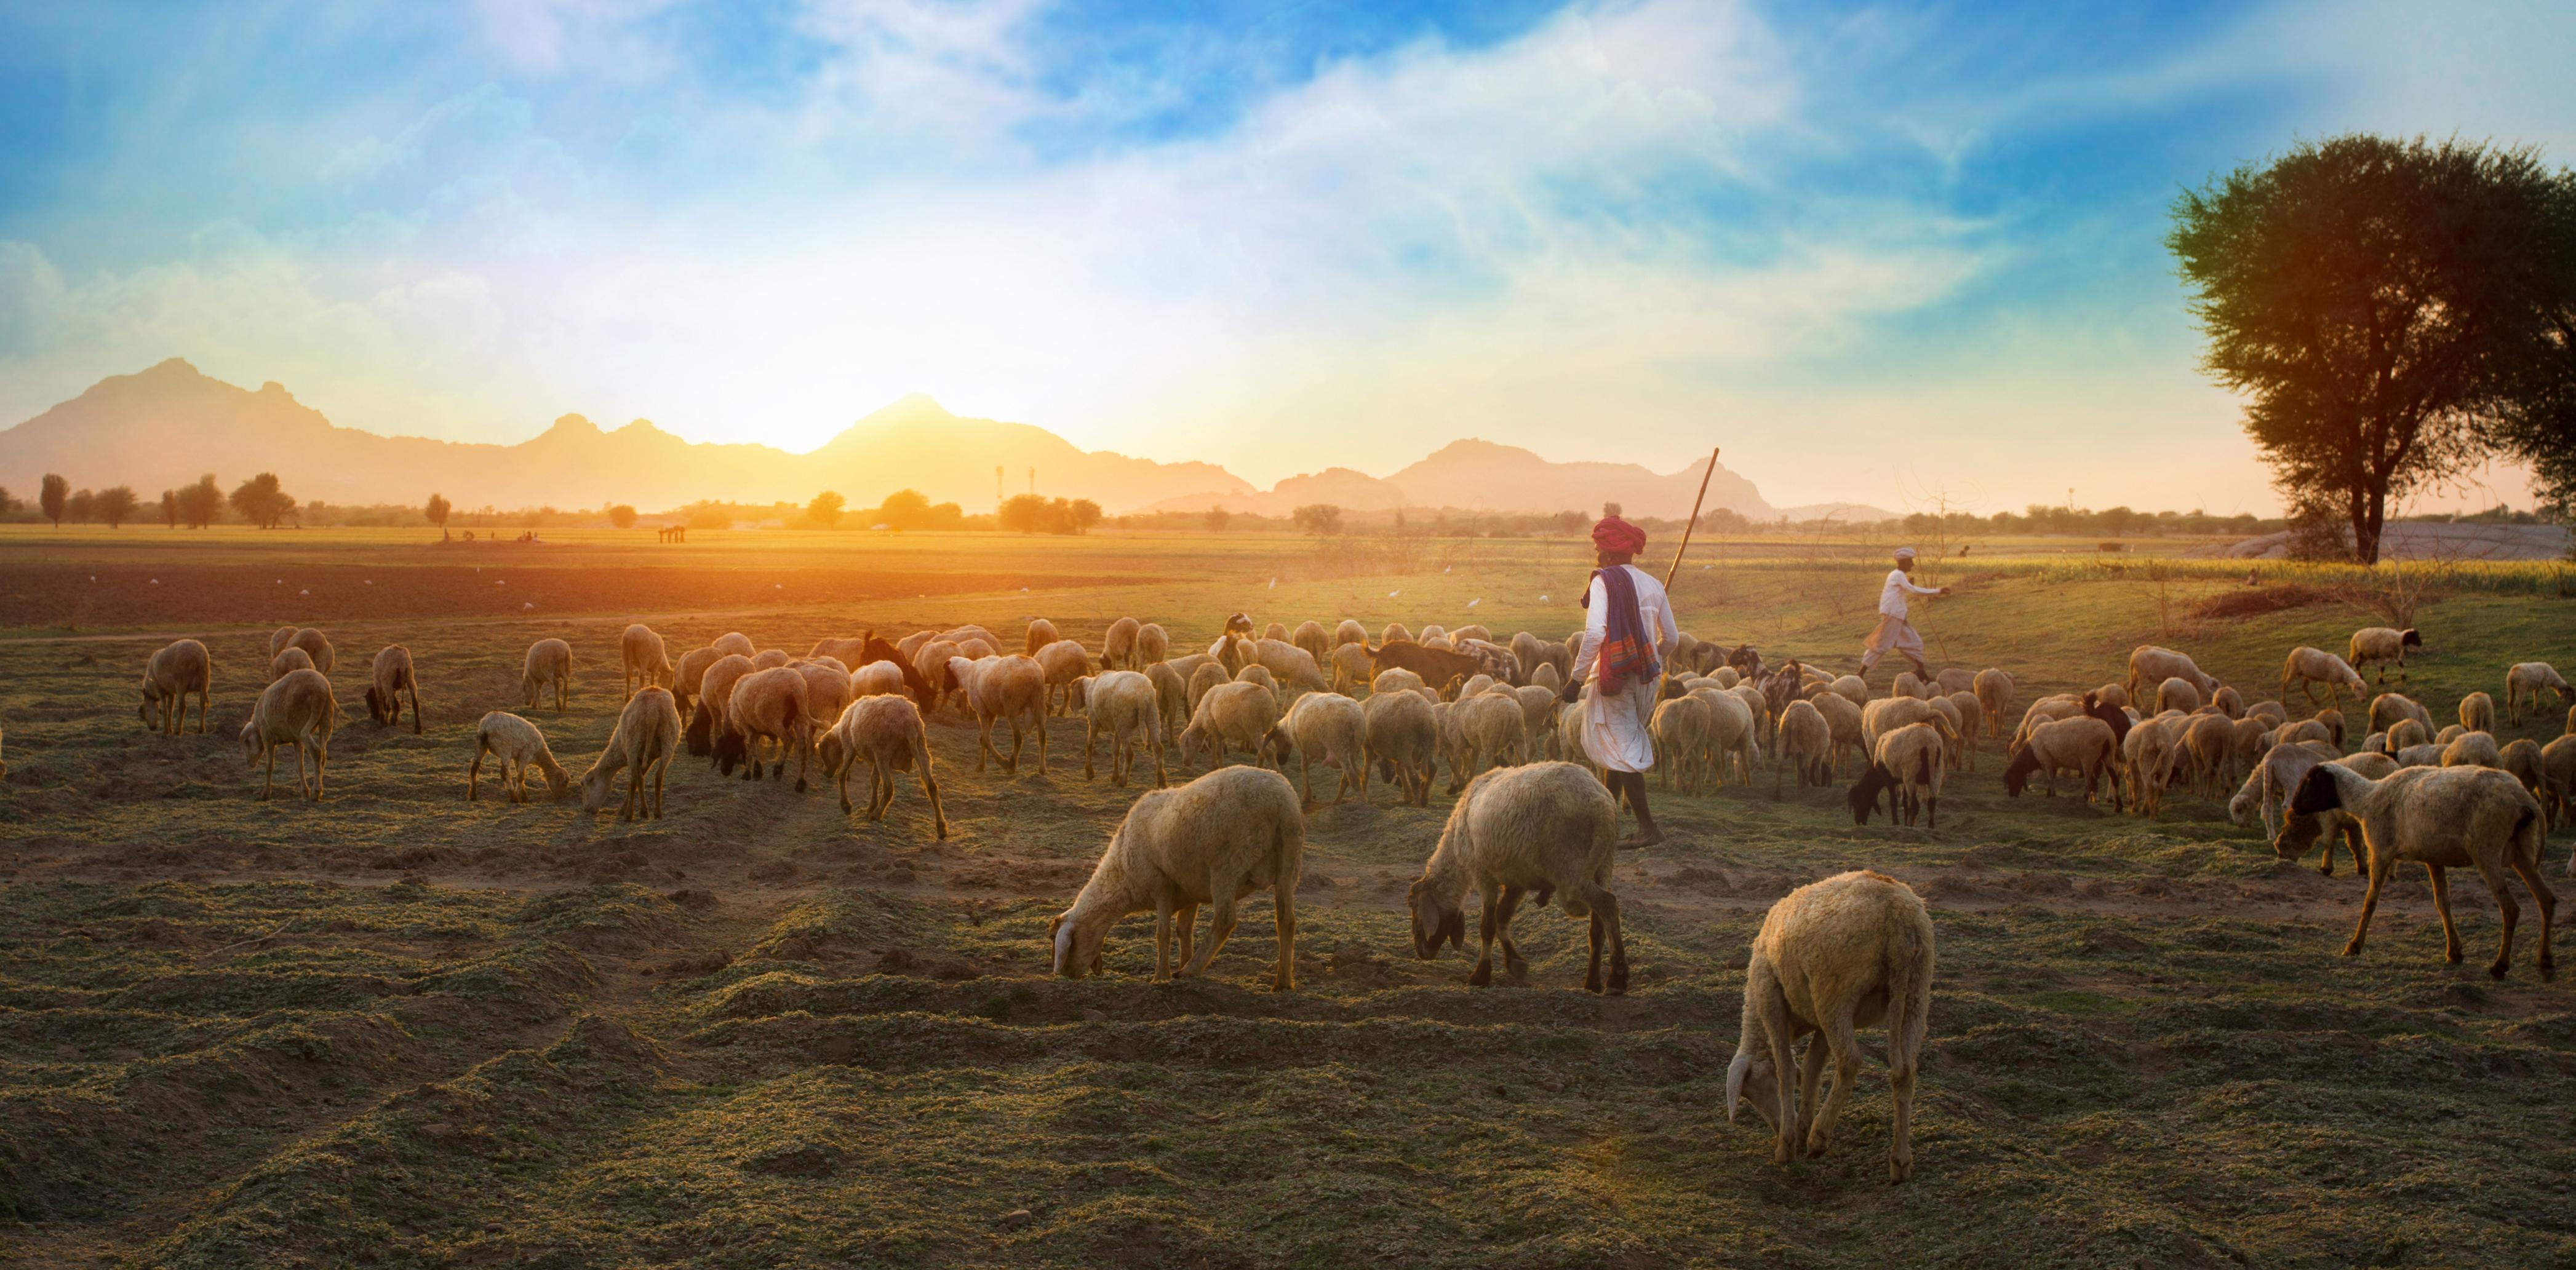 Woe to the Shepherds – Jeremiah 23:1 (Part 2)